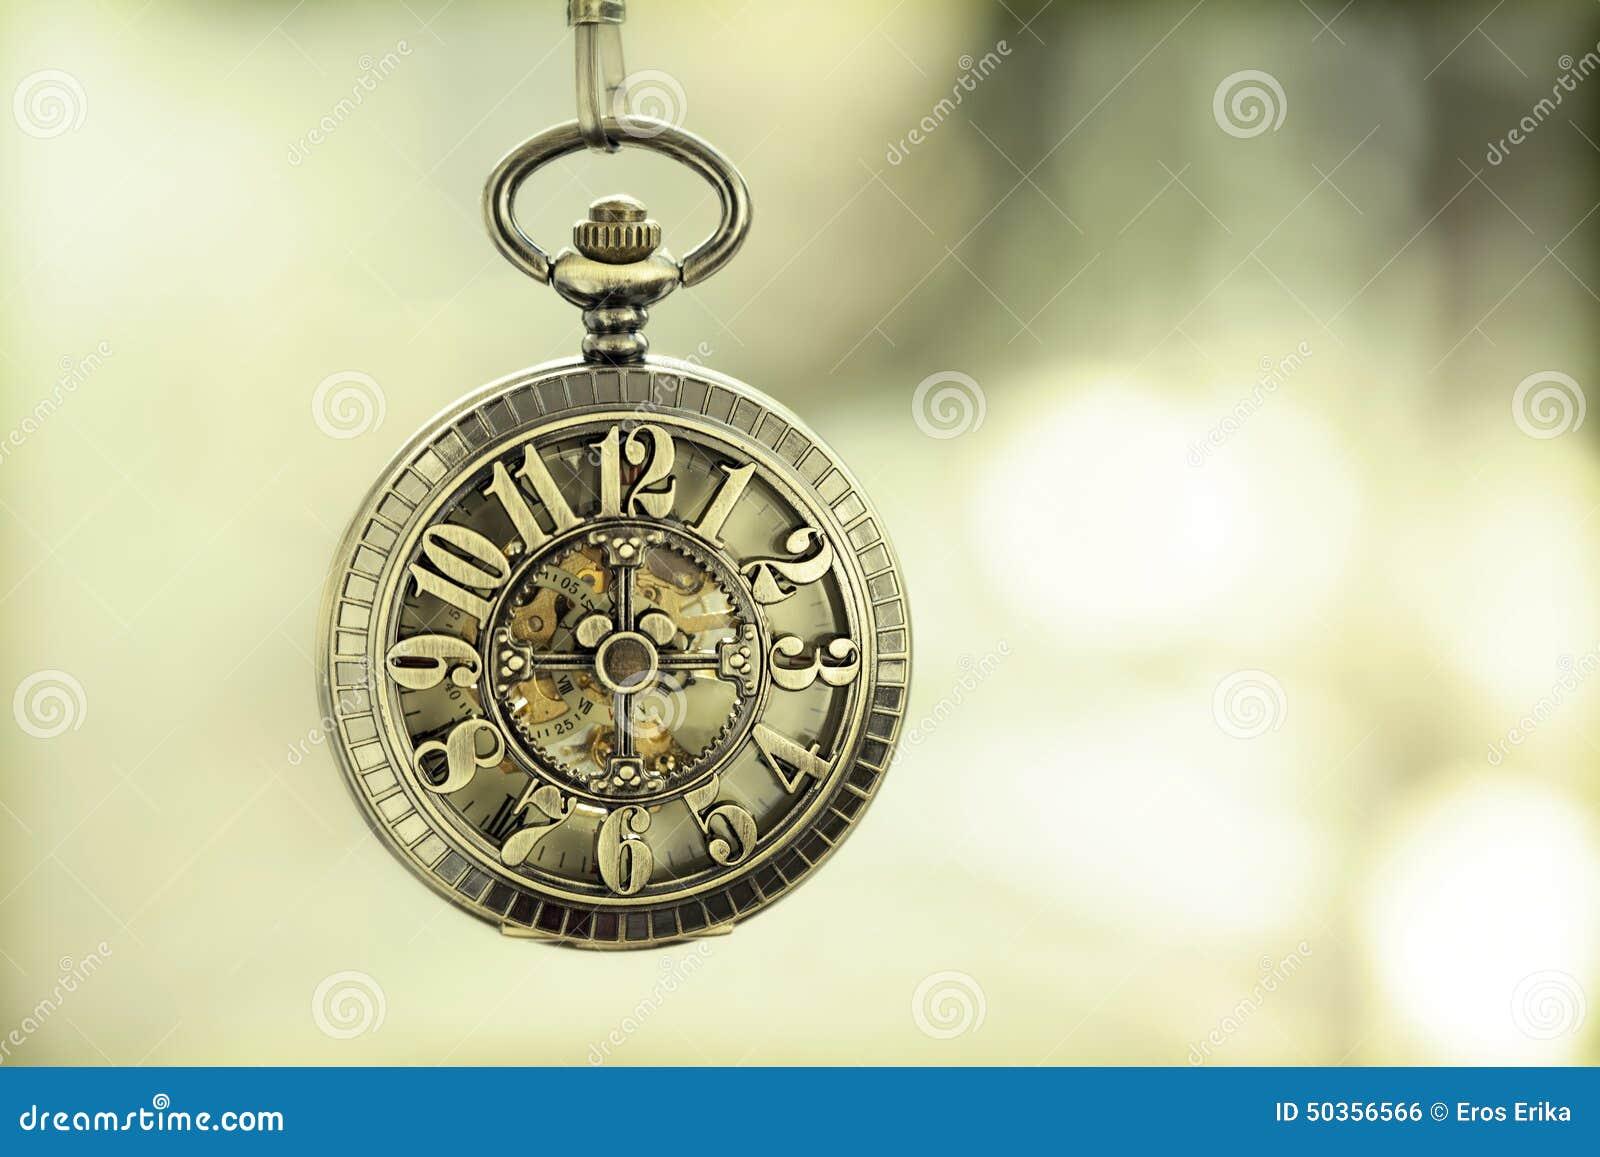 Close Up On Vintage Pocket Watch Stock Photo - Image: 50356566